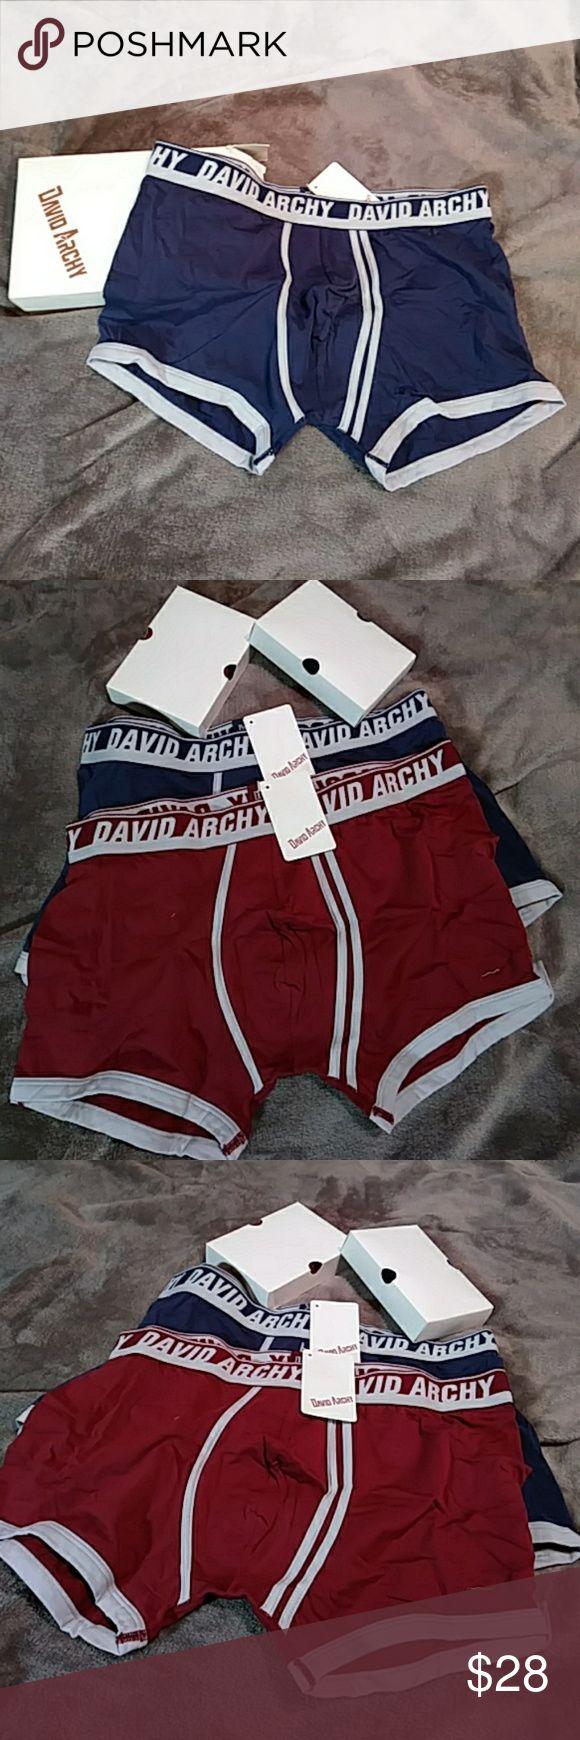 4 pair of David Archy Men's Underwear size 36-38 4 Pair of David Archy men's boxer briefs size 36-38. Brand new with tags, originally $45! Maroon/dark red & Navy Blue. Awesomeness...buy'em! David Archy Underwear & Socks Boxer Briefs